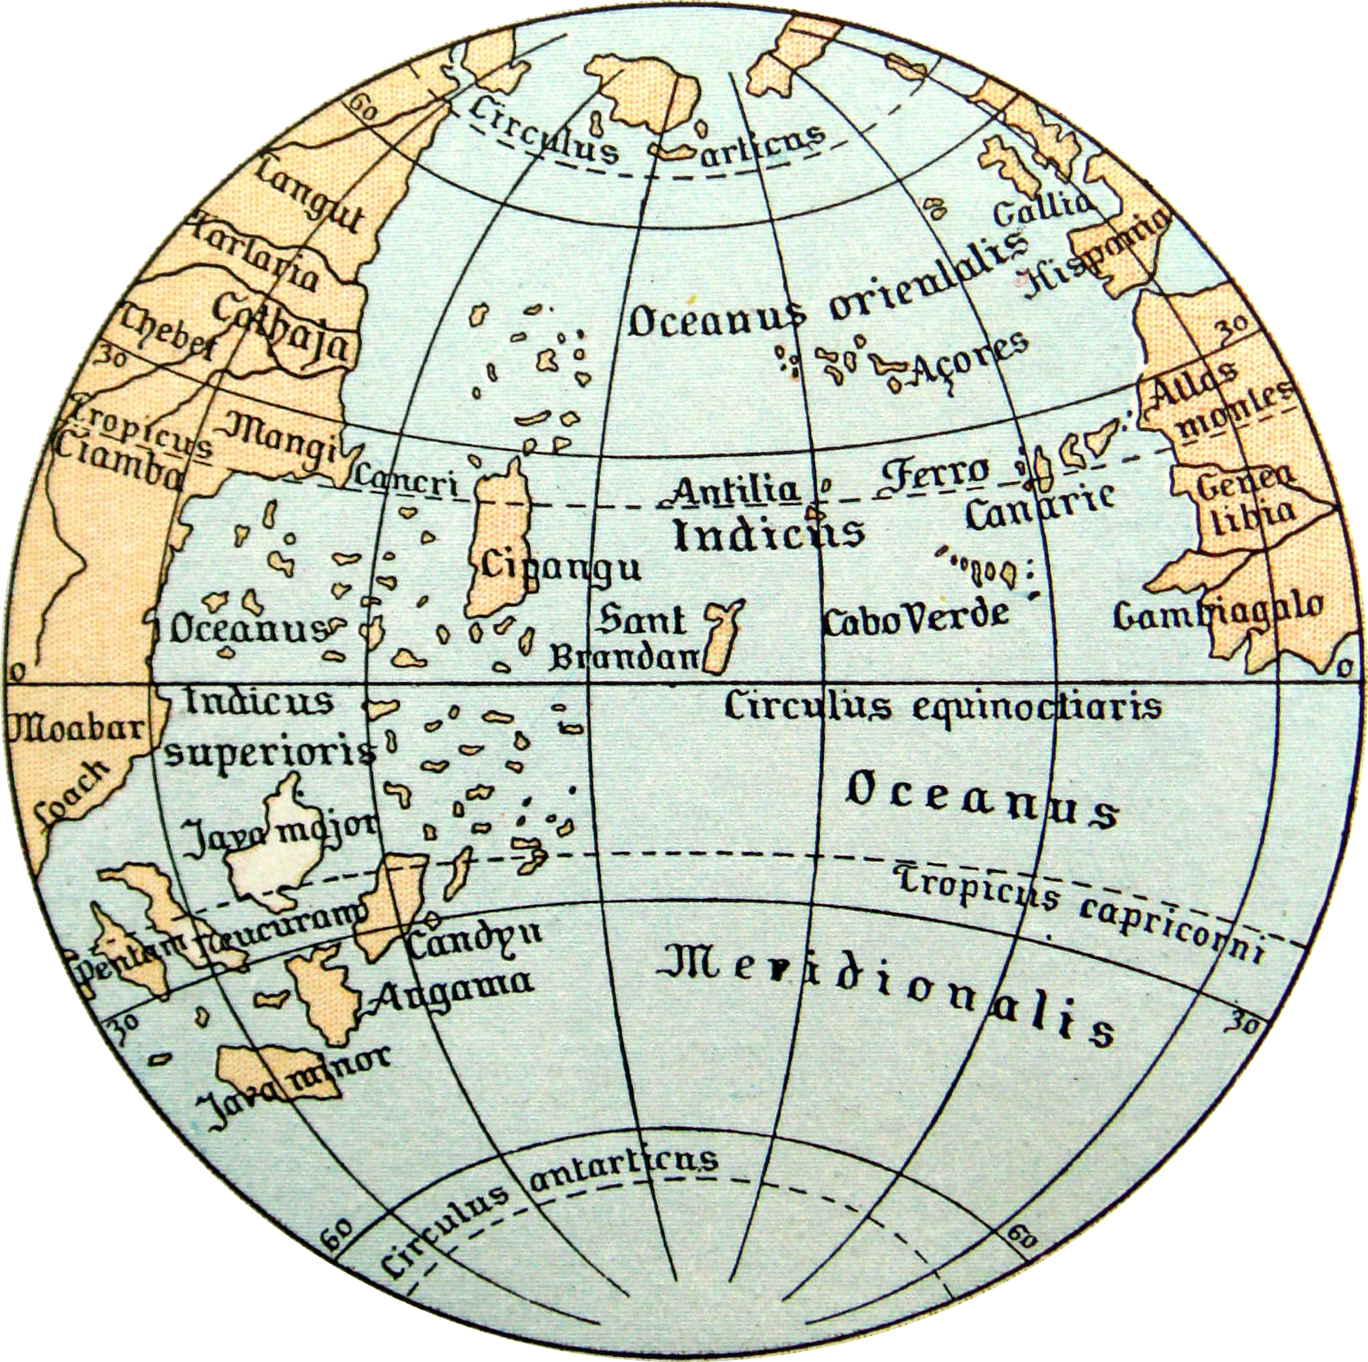 1492 Ocean Map by Martin Behaim - Wikimedia Commons